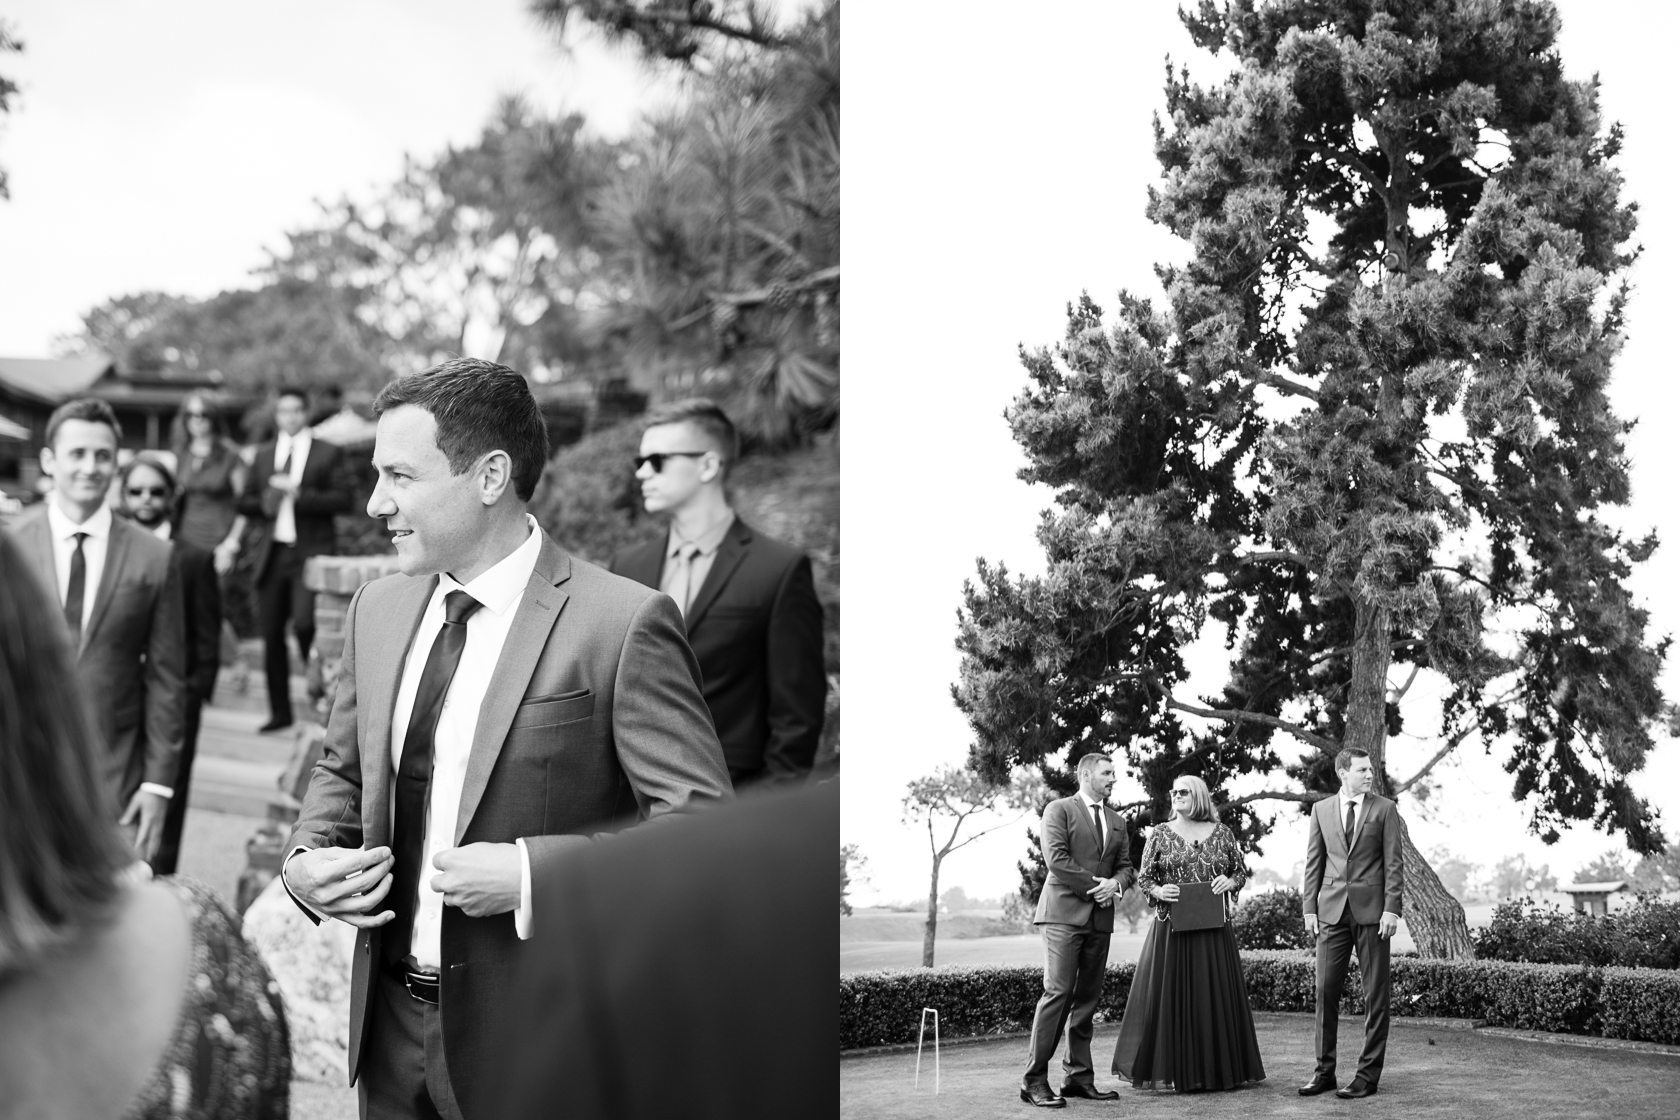 The_Lodge_at_Torrey_Pines_Wedding_030.jpg